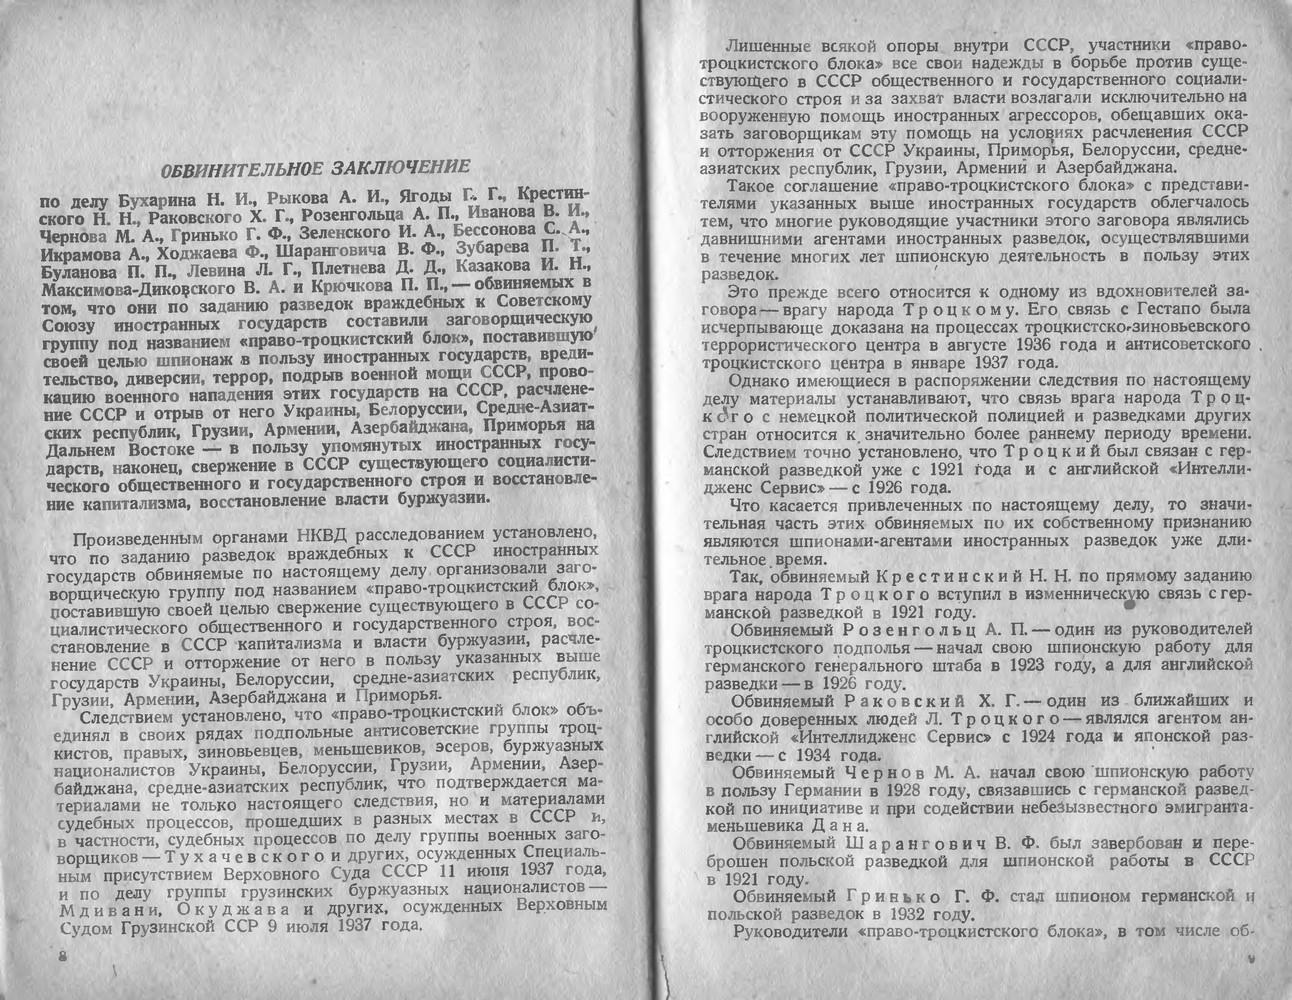 http://i5.imageban.ru/out/2013/11/23/1a756cb50b659d78b0a235971cbae60a.jpg